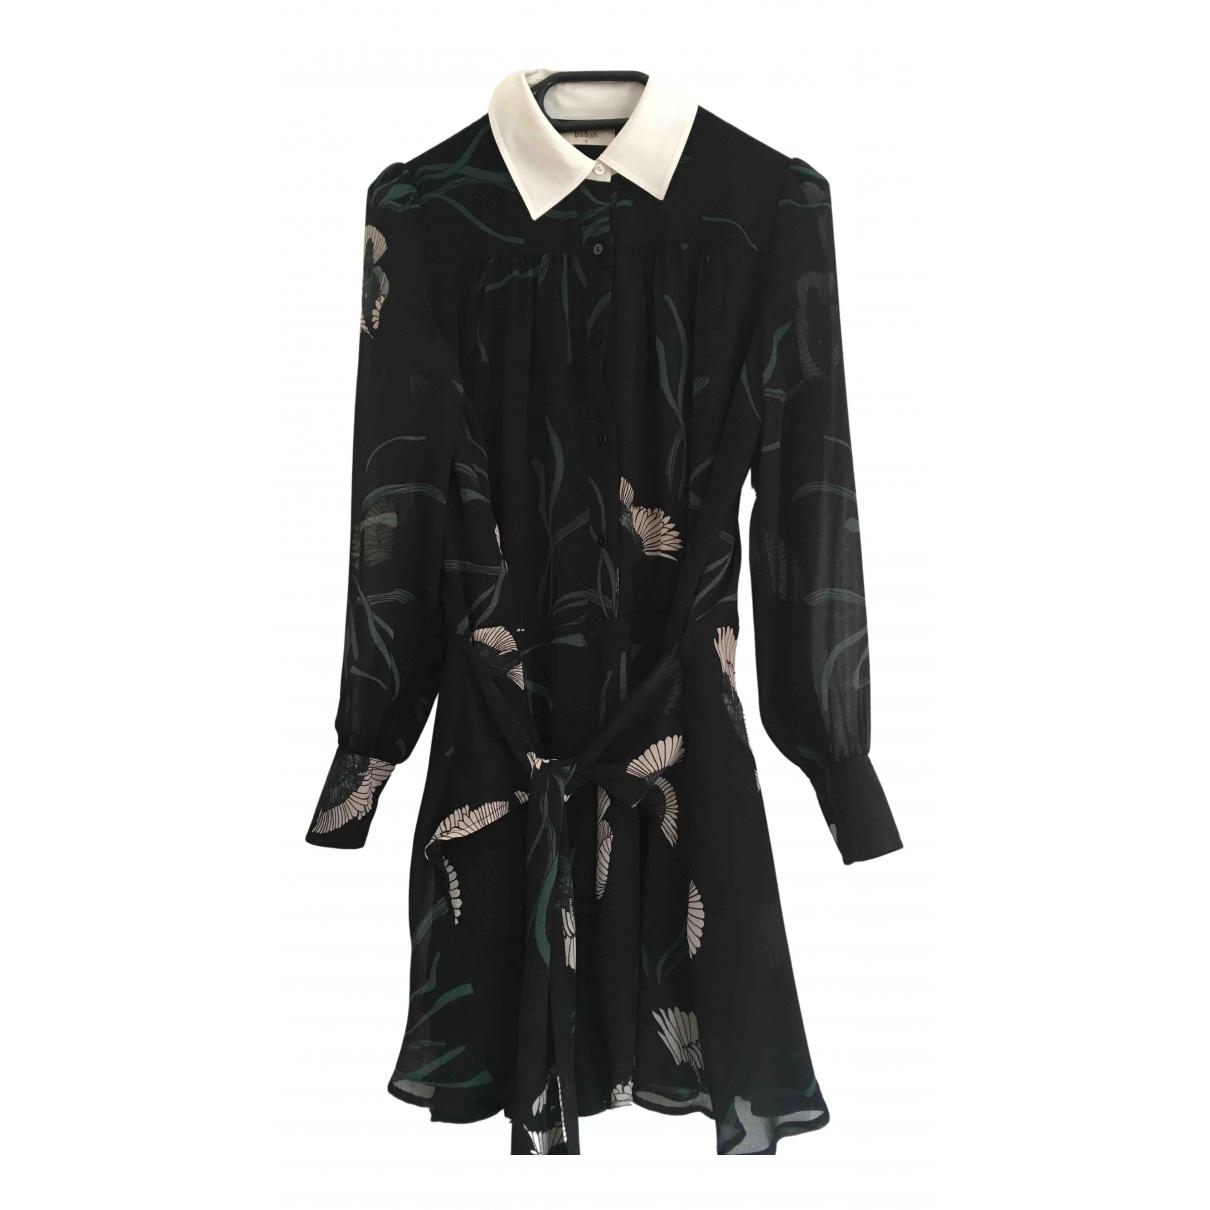 Ba&sh \N Black dress for Women 1 US